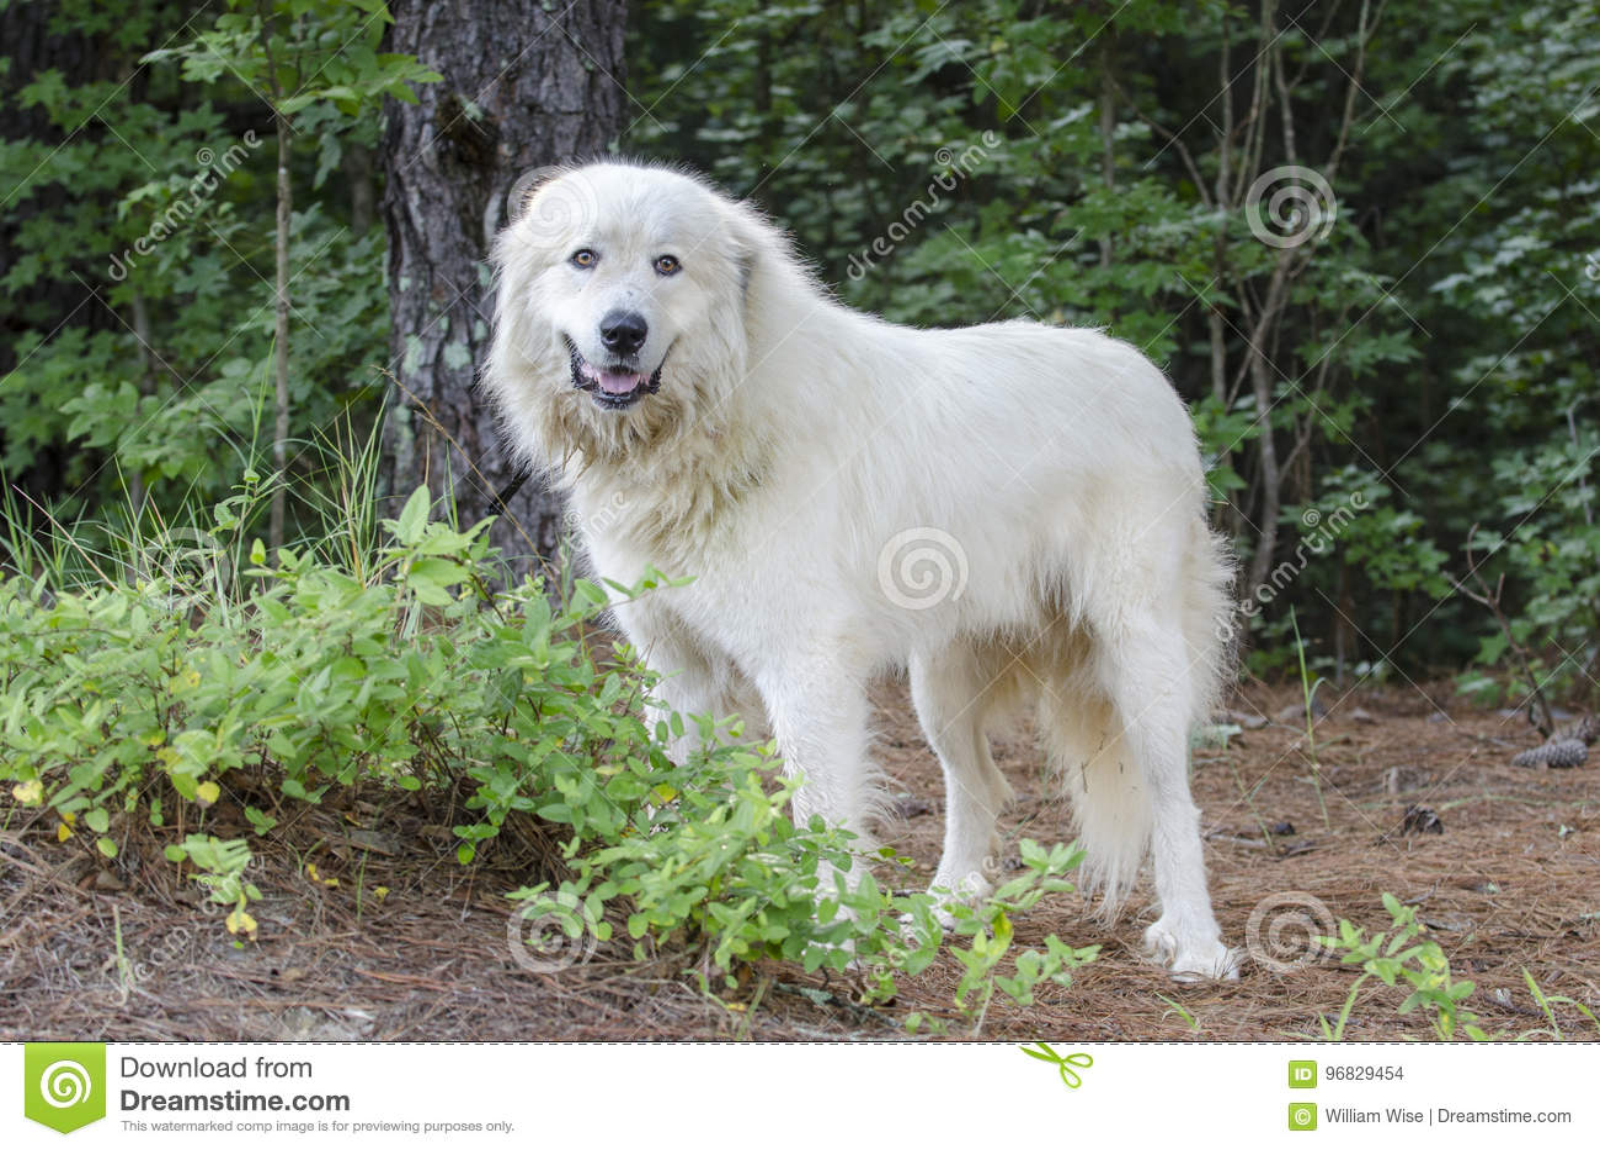 Great Pyrenees Livestock Guard Dog